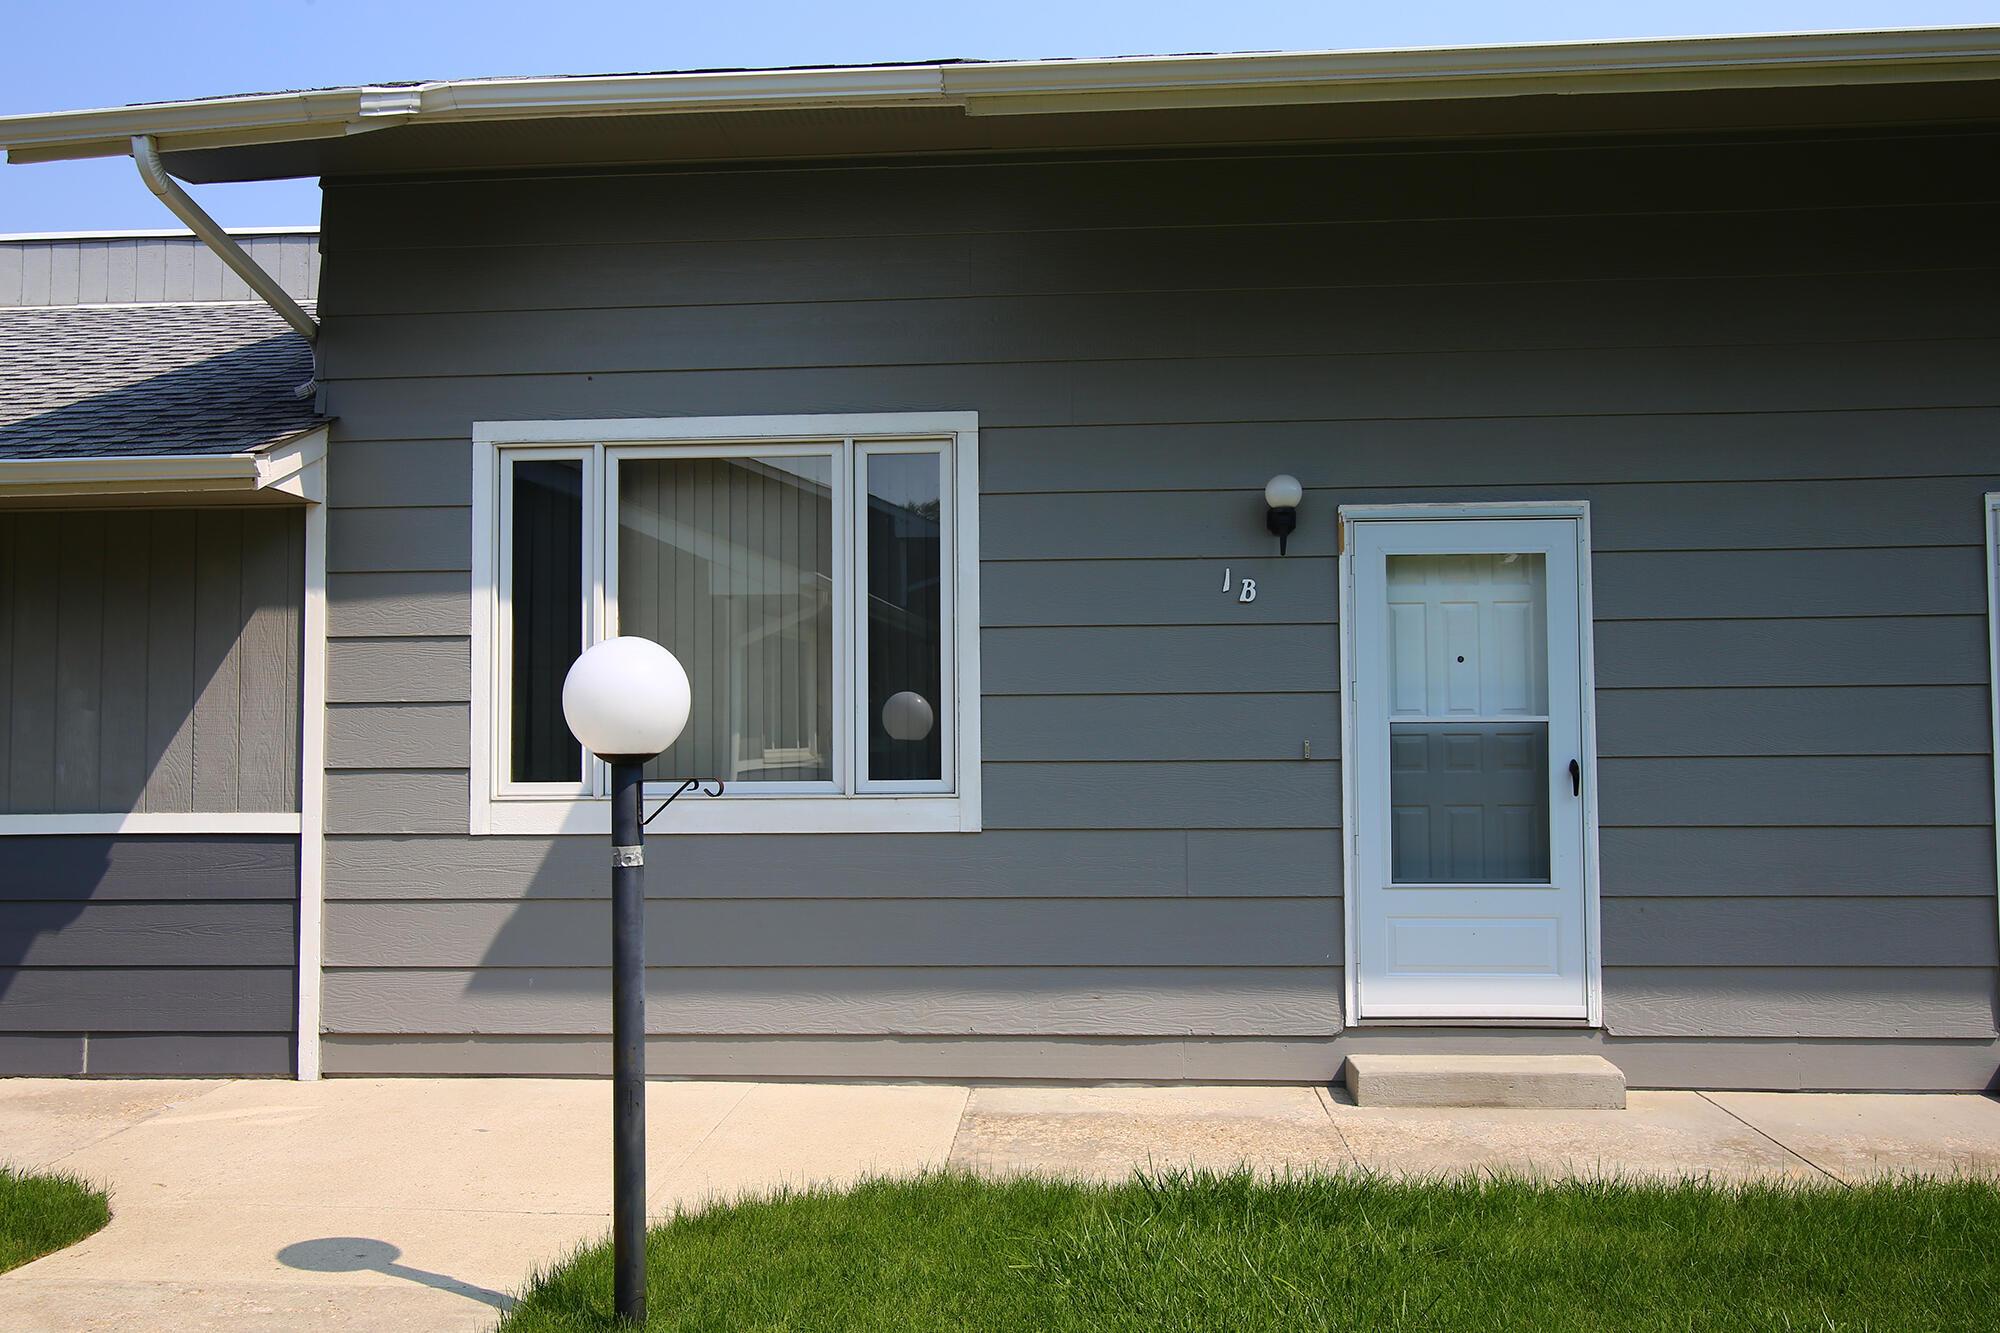 1500 De Smet Avenue, Sheridan, Wyoming 82801, 3 Bedrooms Bedrooms, ,1.75 BathroomsBathrooms,Residential,For Sale,De Smet,21-821